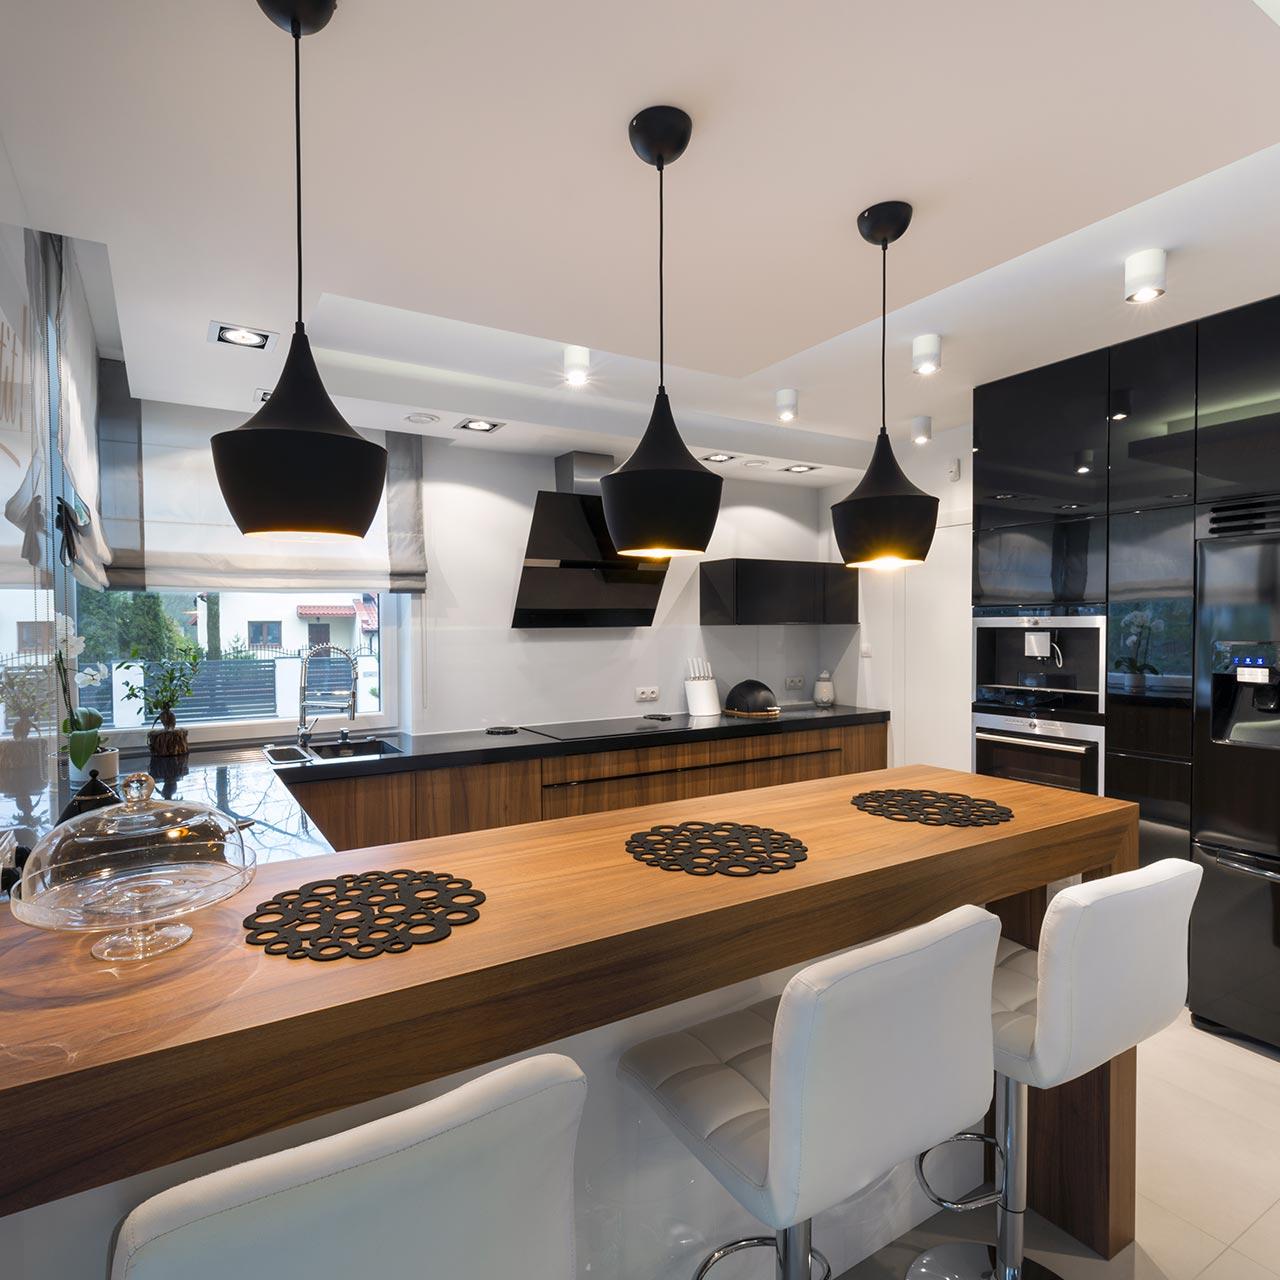 European Modular Kitchen Design